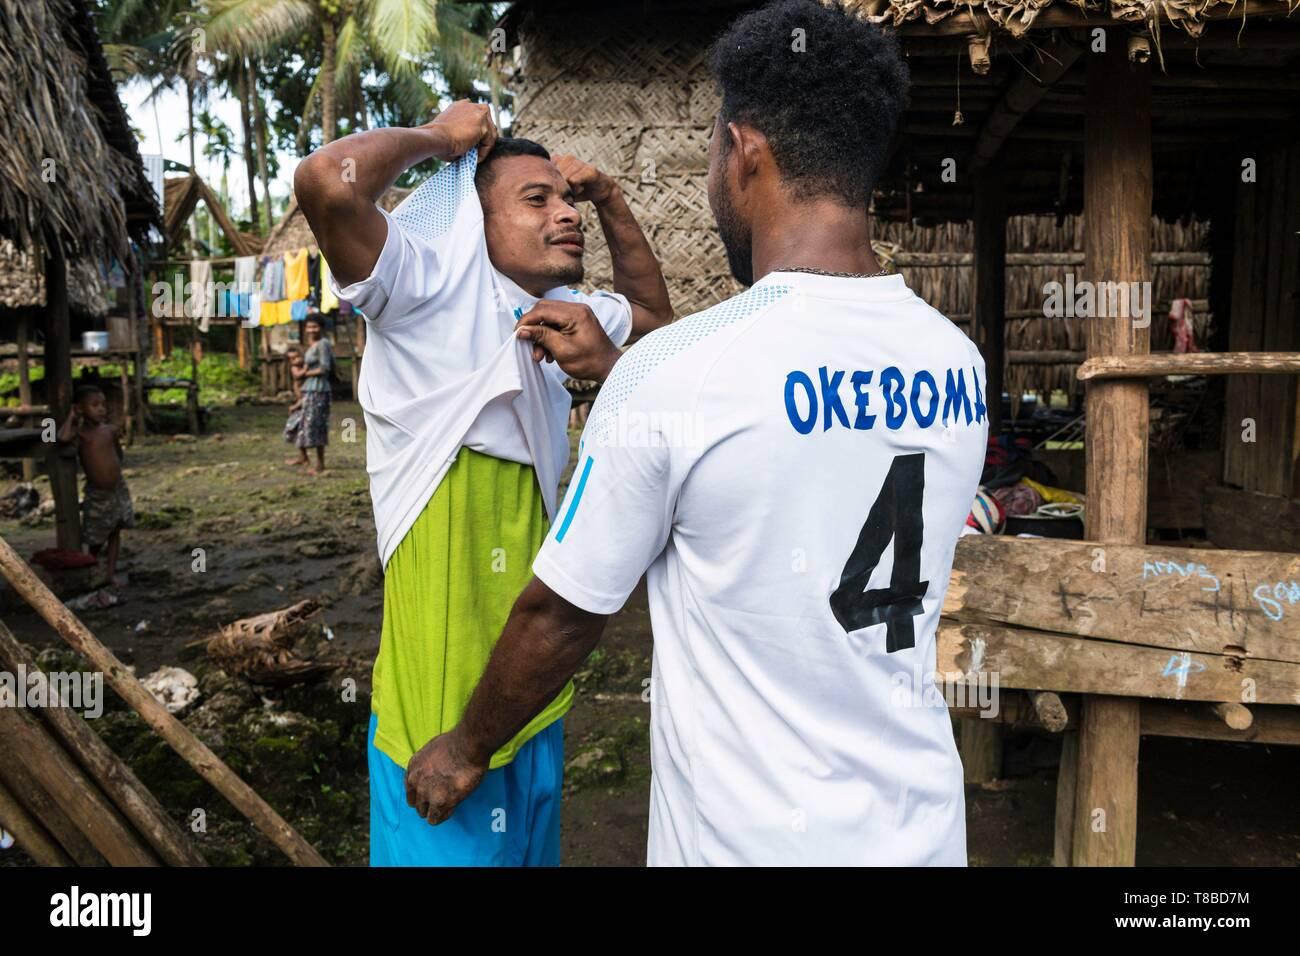 Papua New Guinea, Milne Bay Province, Encastreaux Sea, Trobriands Archipelago, Kiriwina Island, Okaiboma Village, soccer team - Stock Image